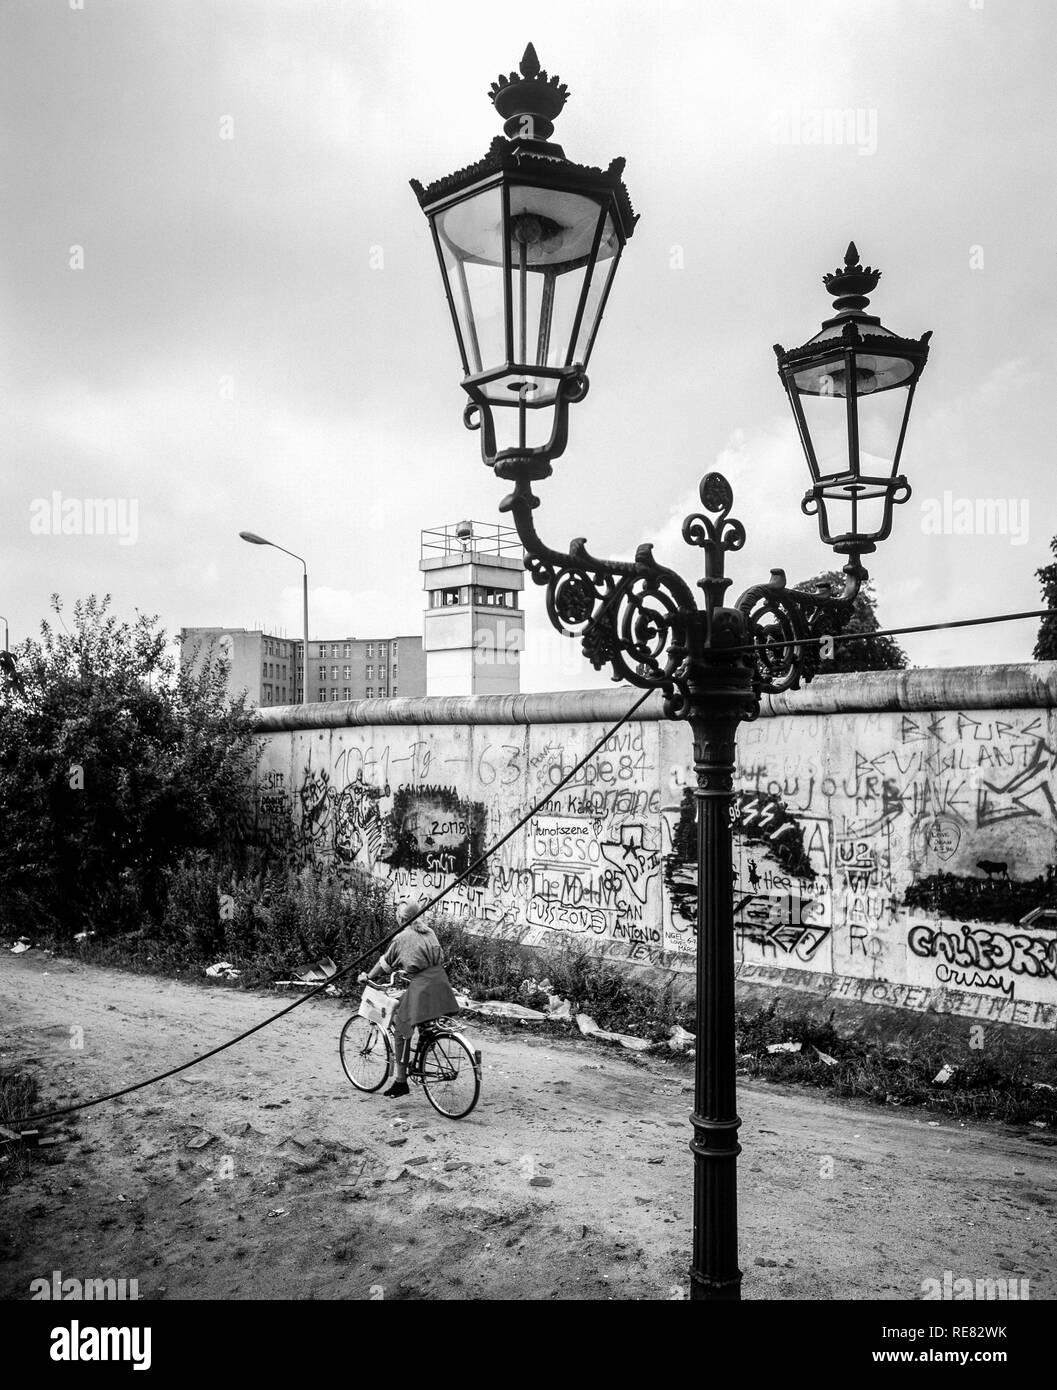 August 1986, Berlin Wall graffitis, street lamp, cyclist, East Berlin watchtower, Zimmerstrasse street, Kreuzberg, West Berlin side, Germany, Europe, - Stock Image